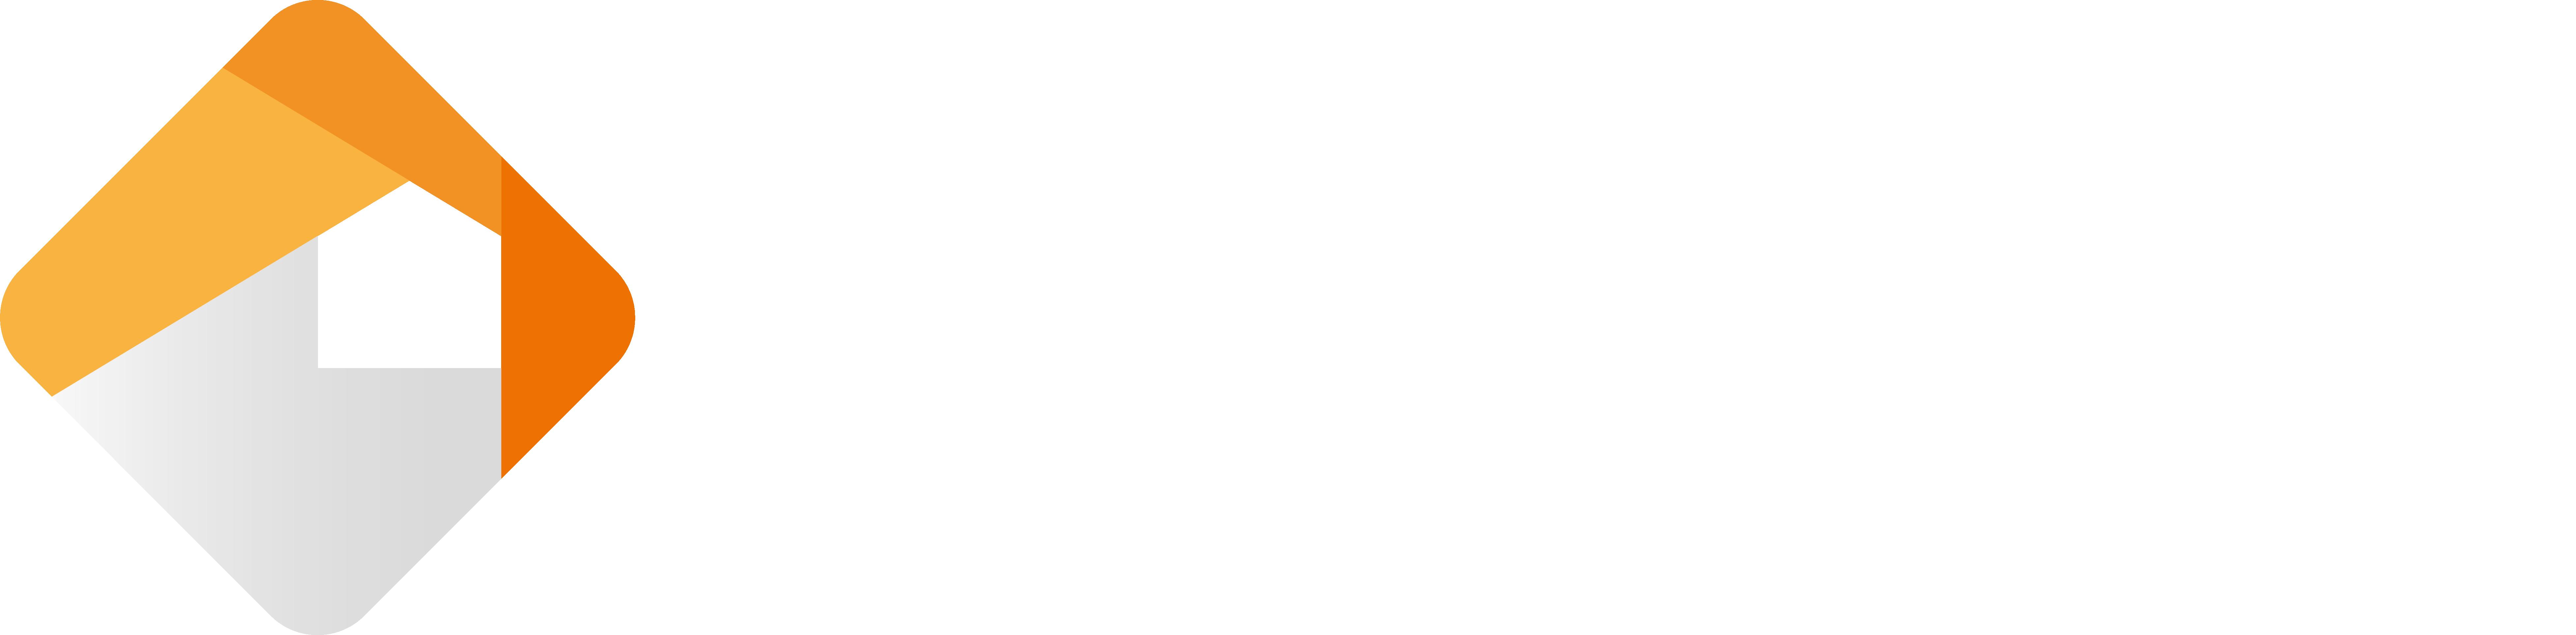 MUXE Media Channel